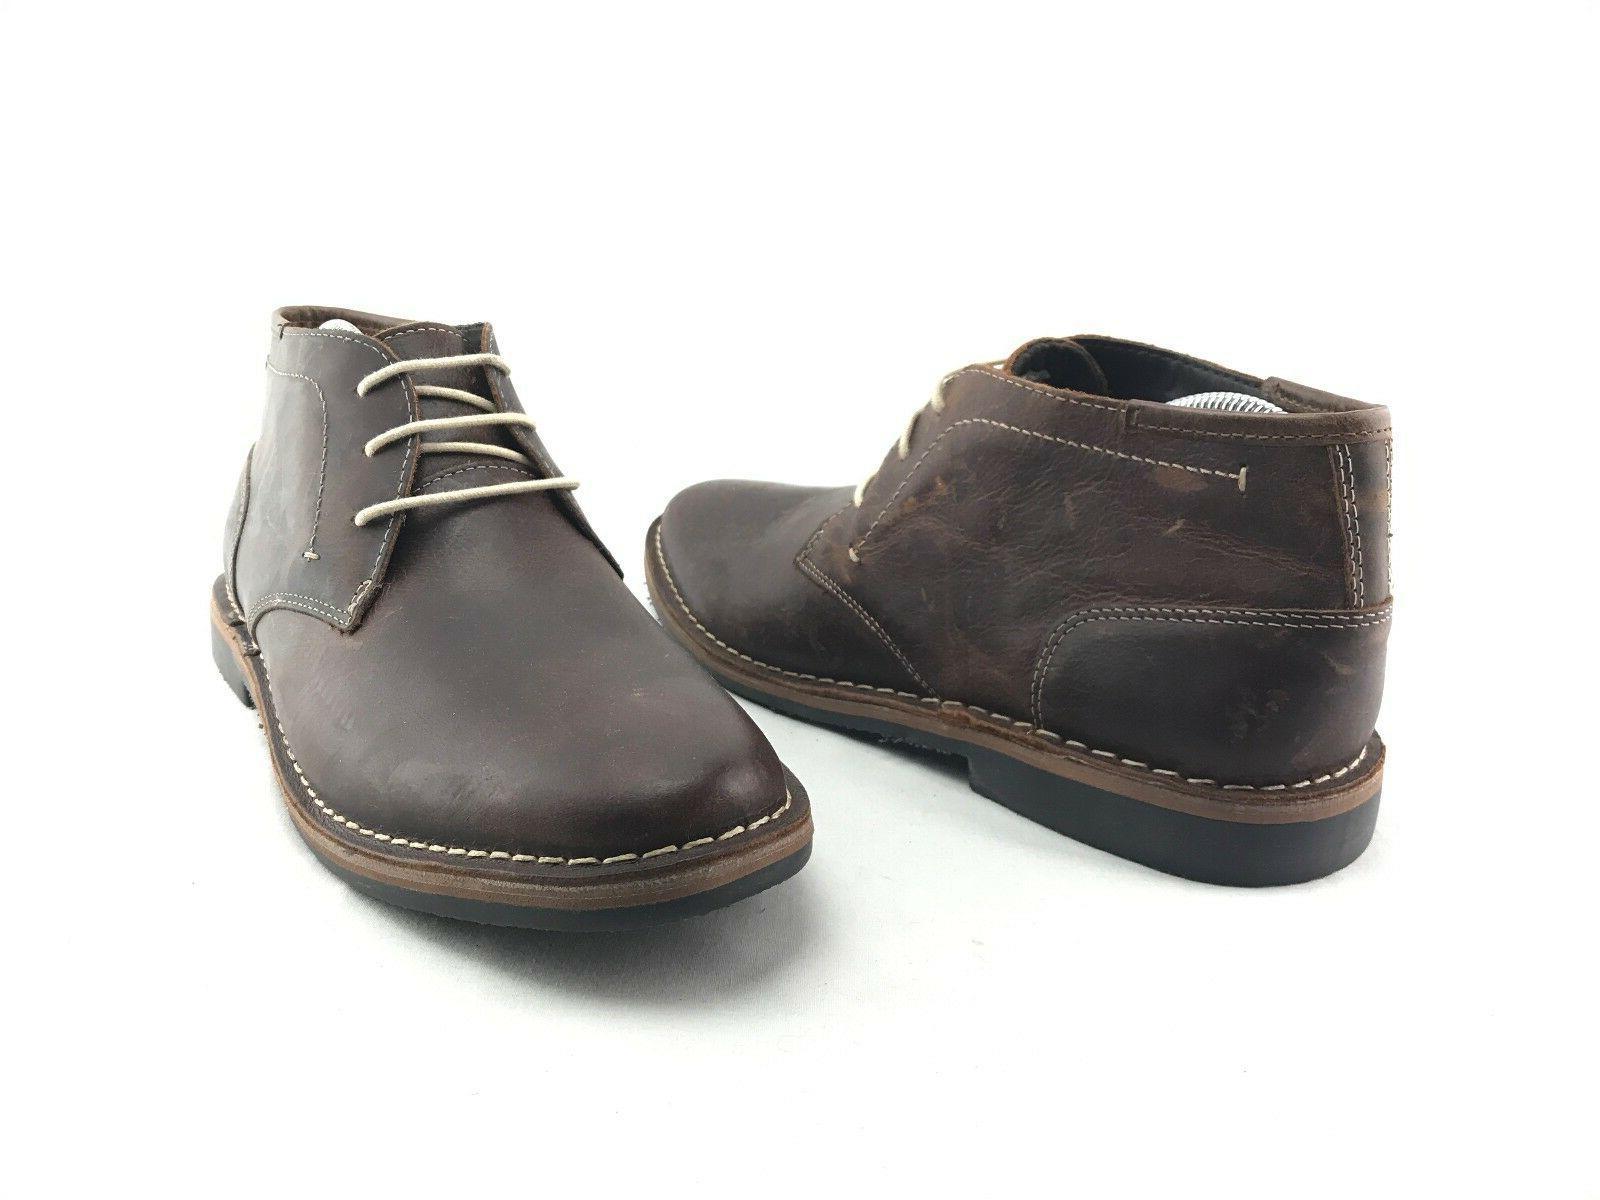 hestonn mens brown leather chukka boots us